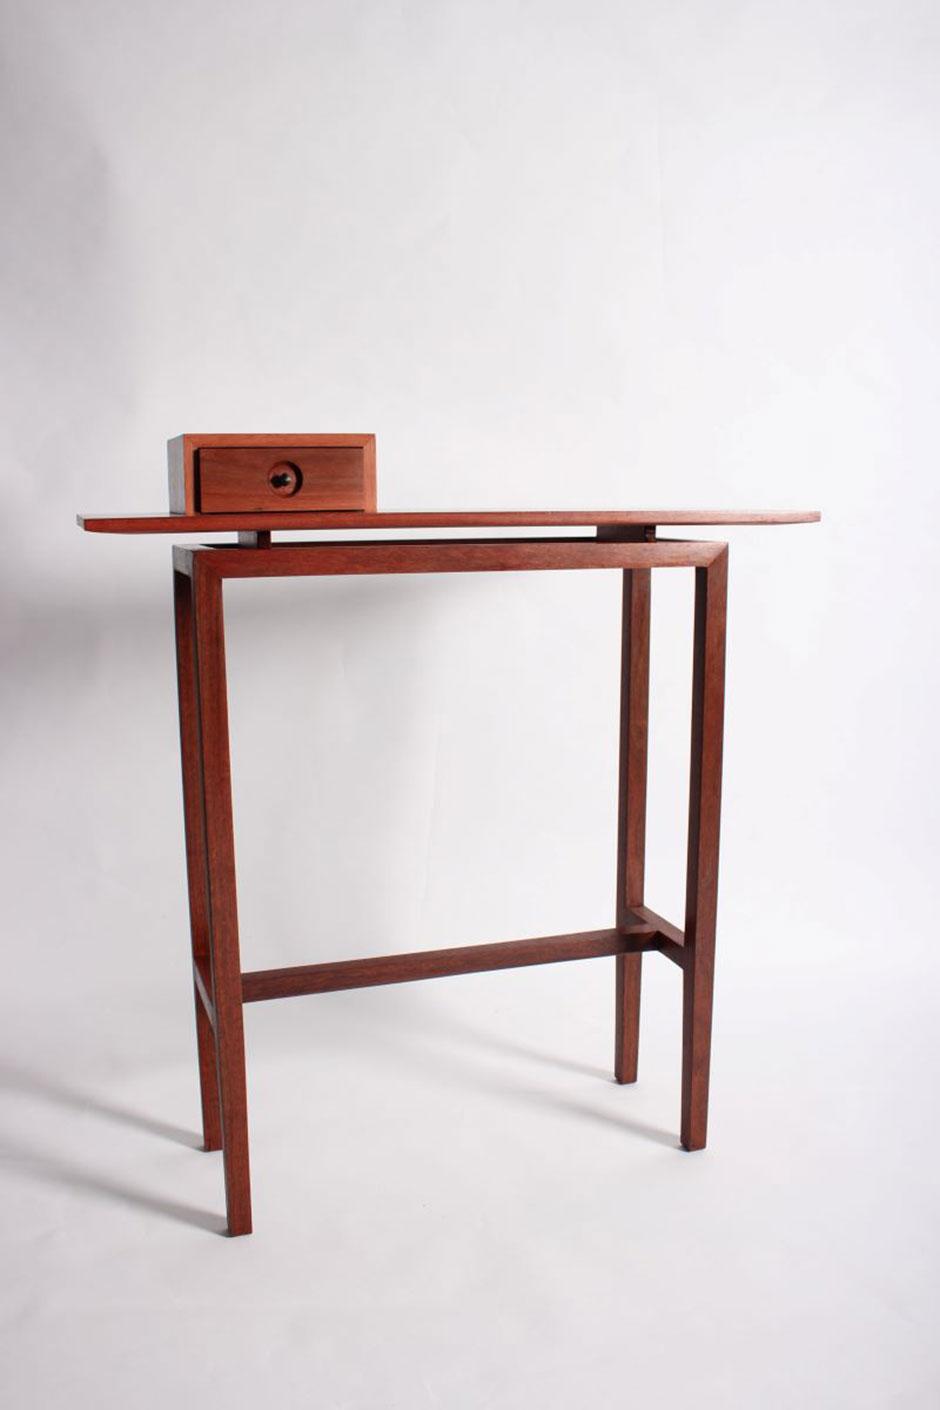 phoebe everill hall table